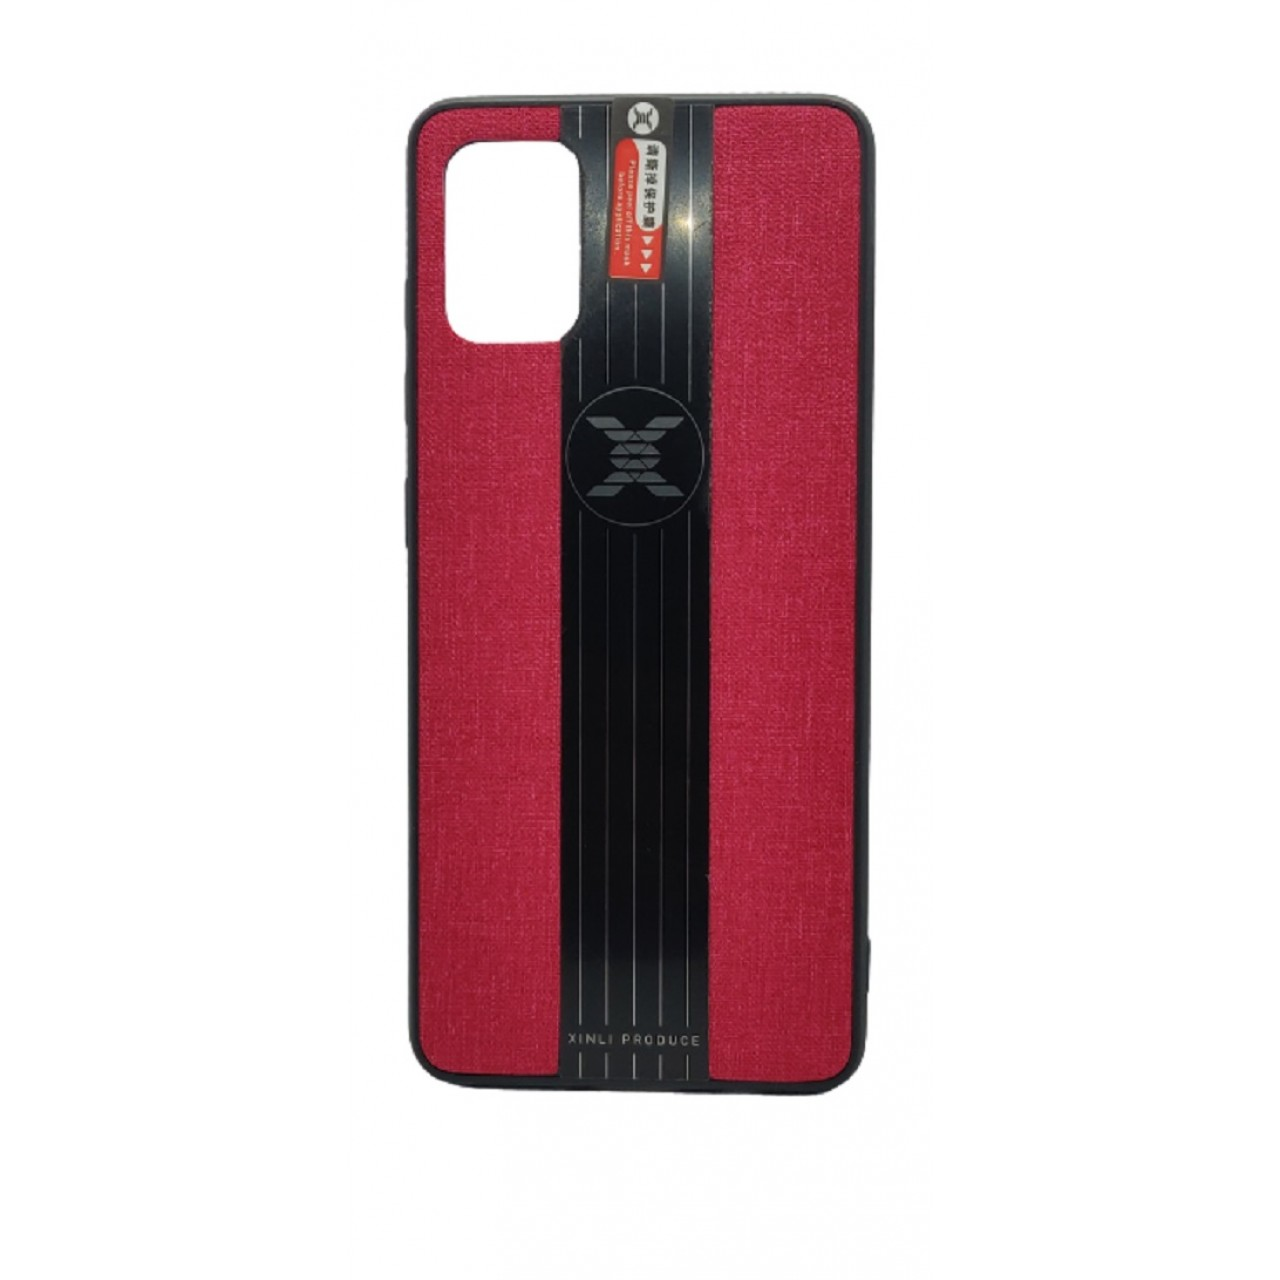 Back Case Cloth Pattern with ring for Samsung A71 Red - Θήκη προστασίας με δαχτυλίδι στην πλάτη Κόκκινη - OEM